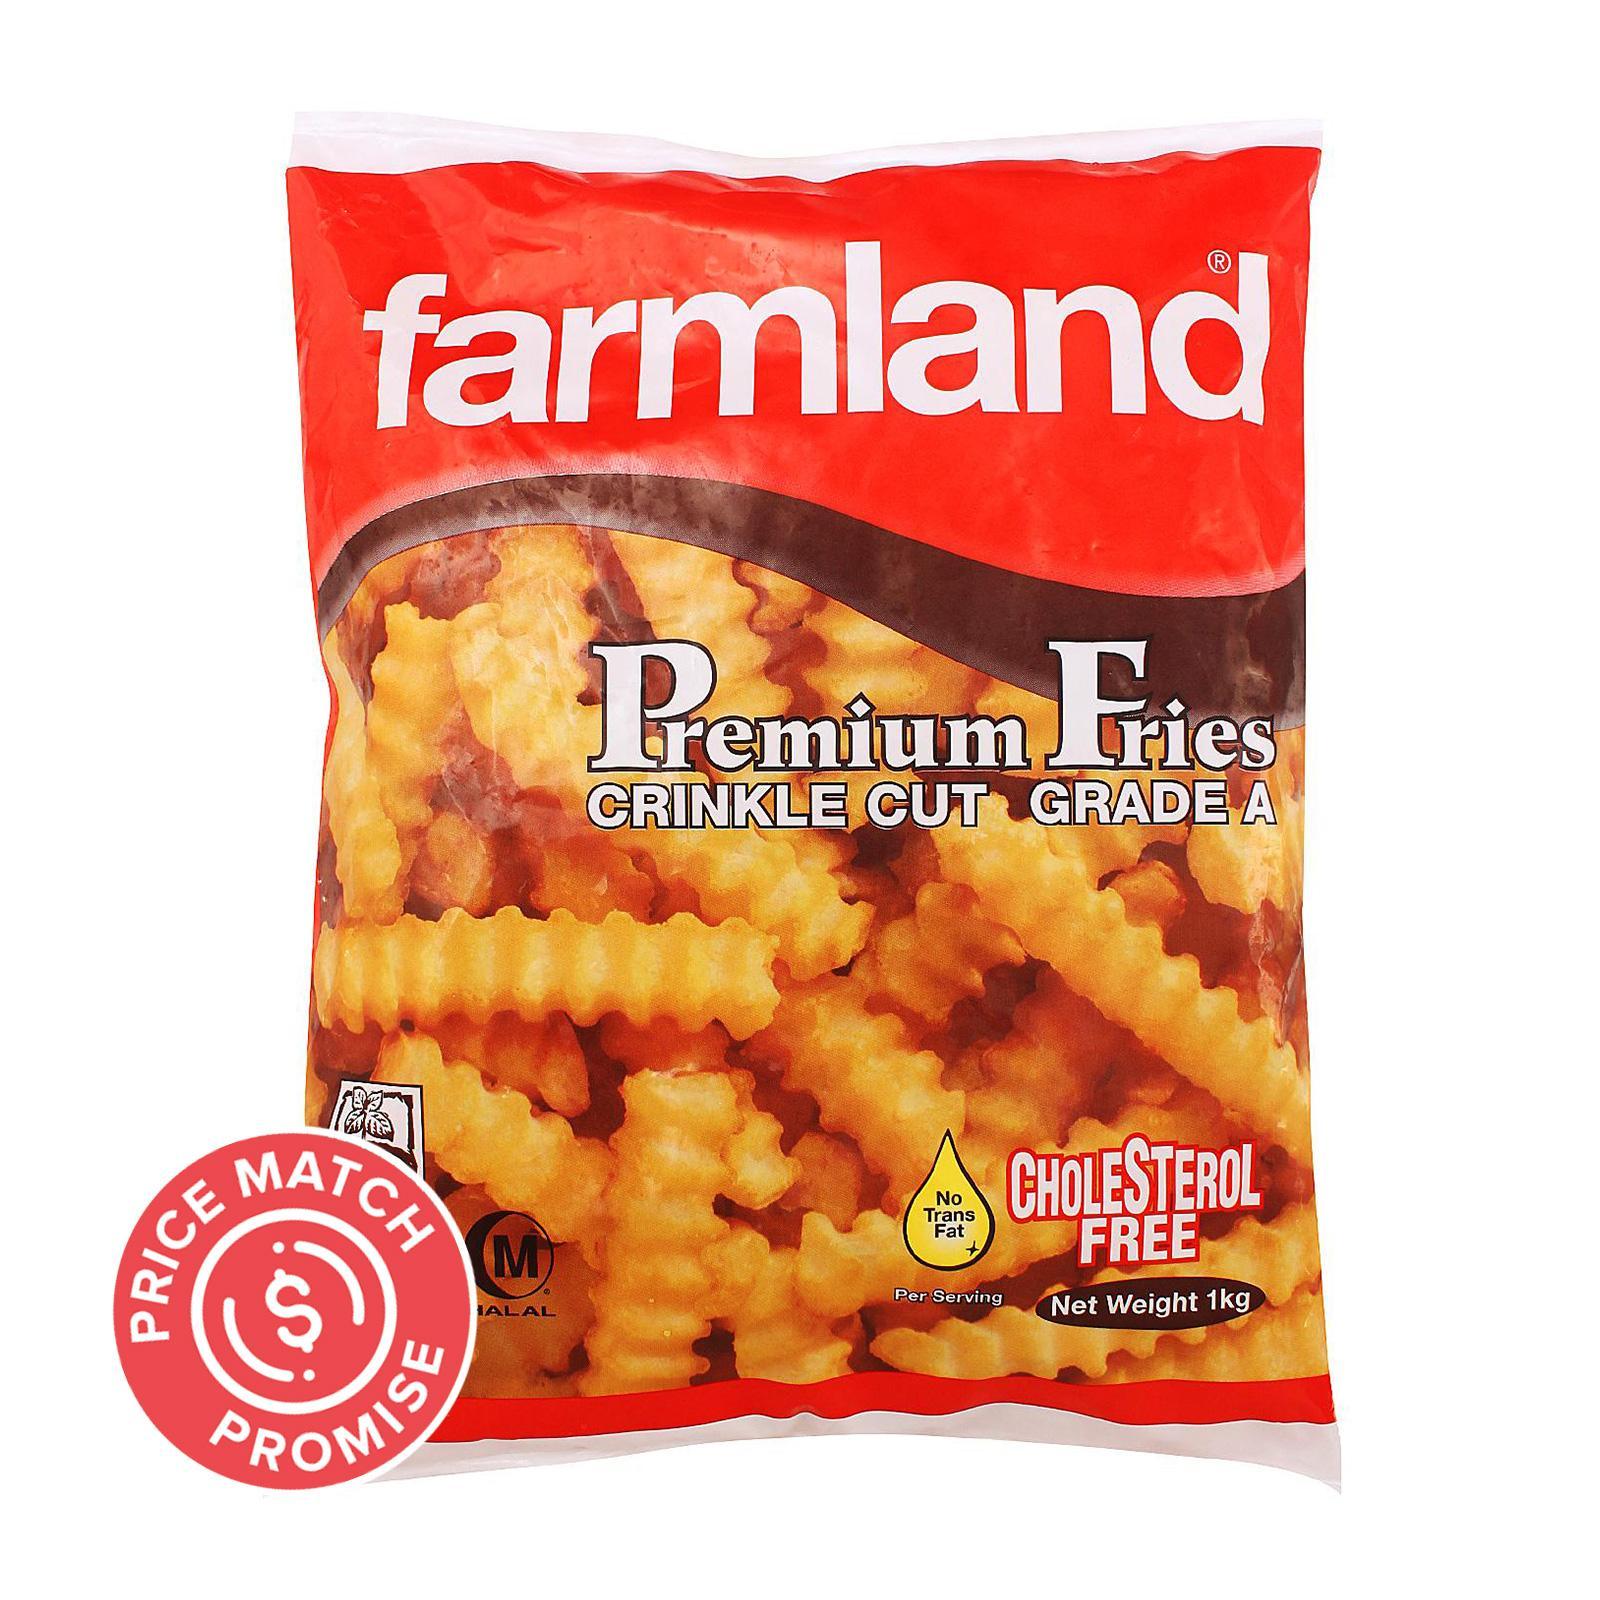 Farmland Premium Fries - Crinkle Cut 1KG